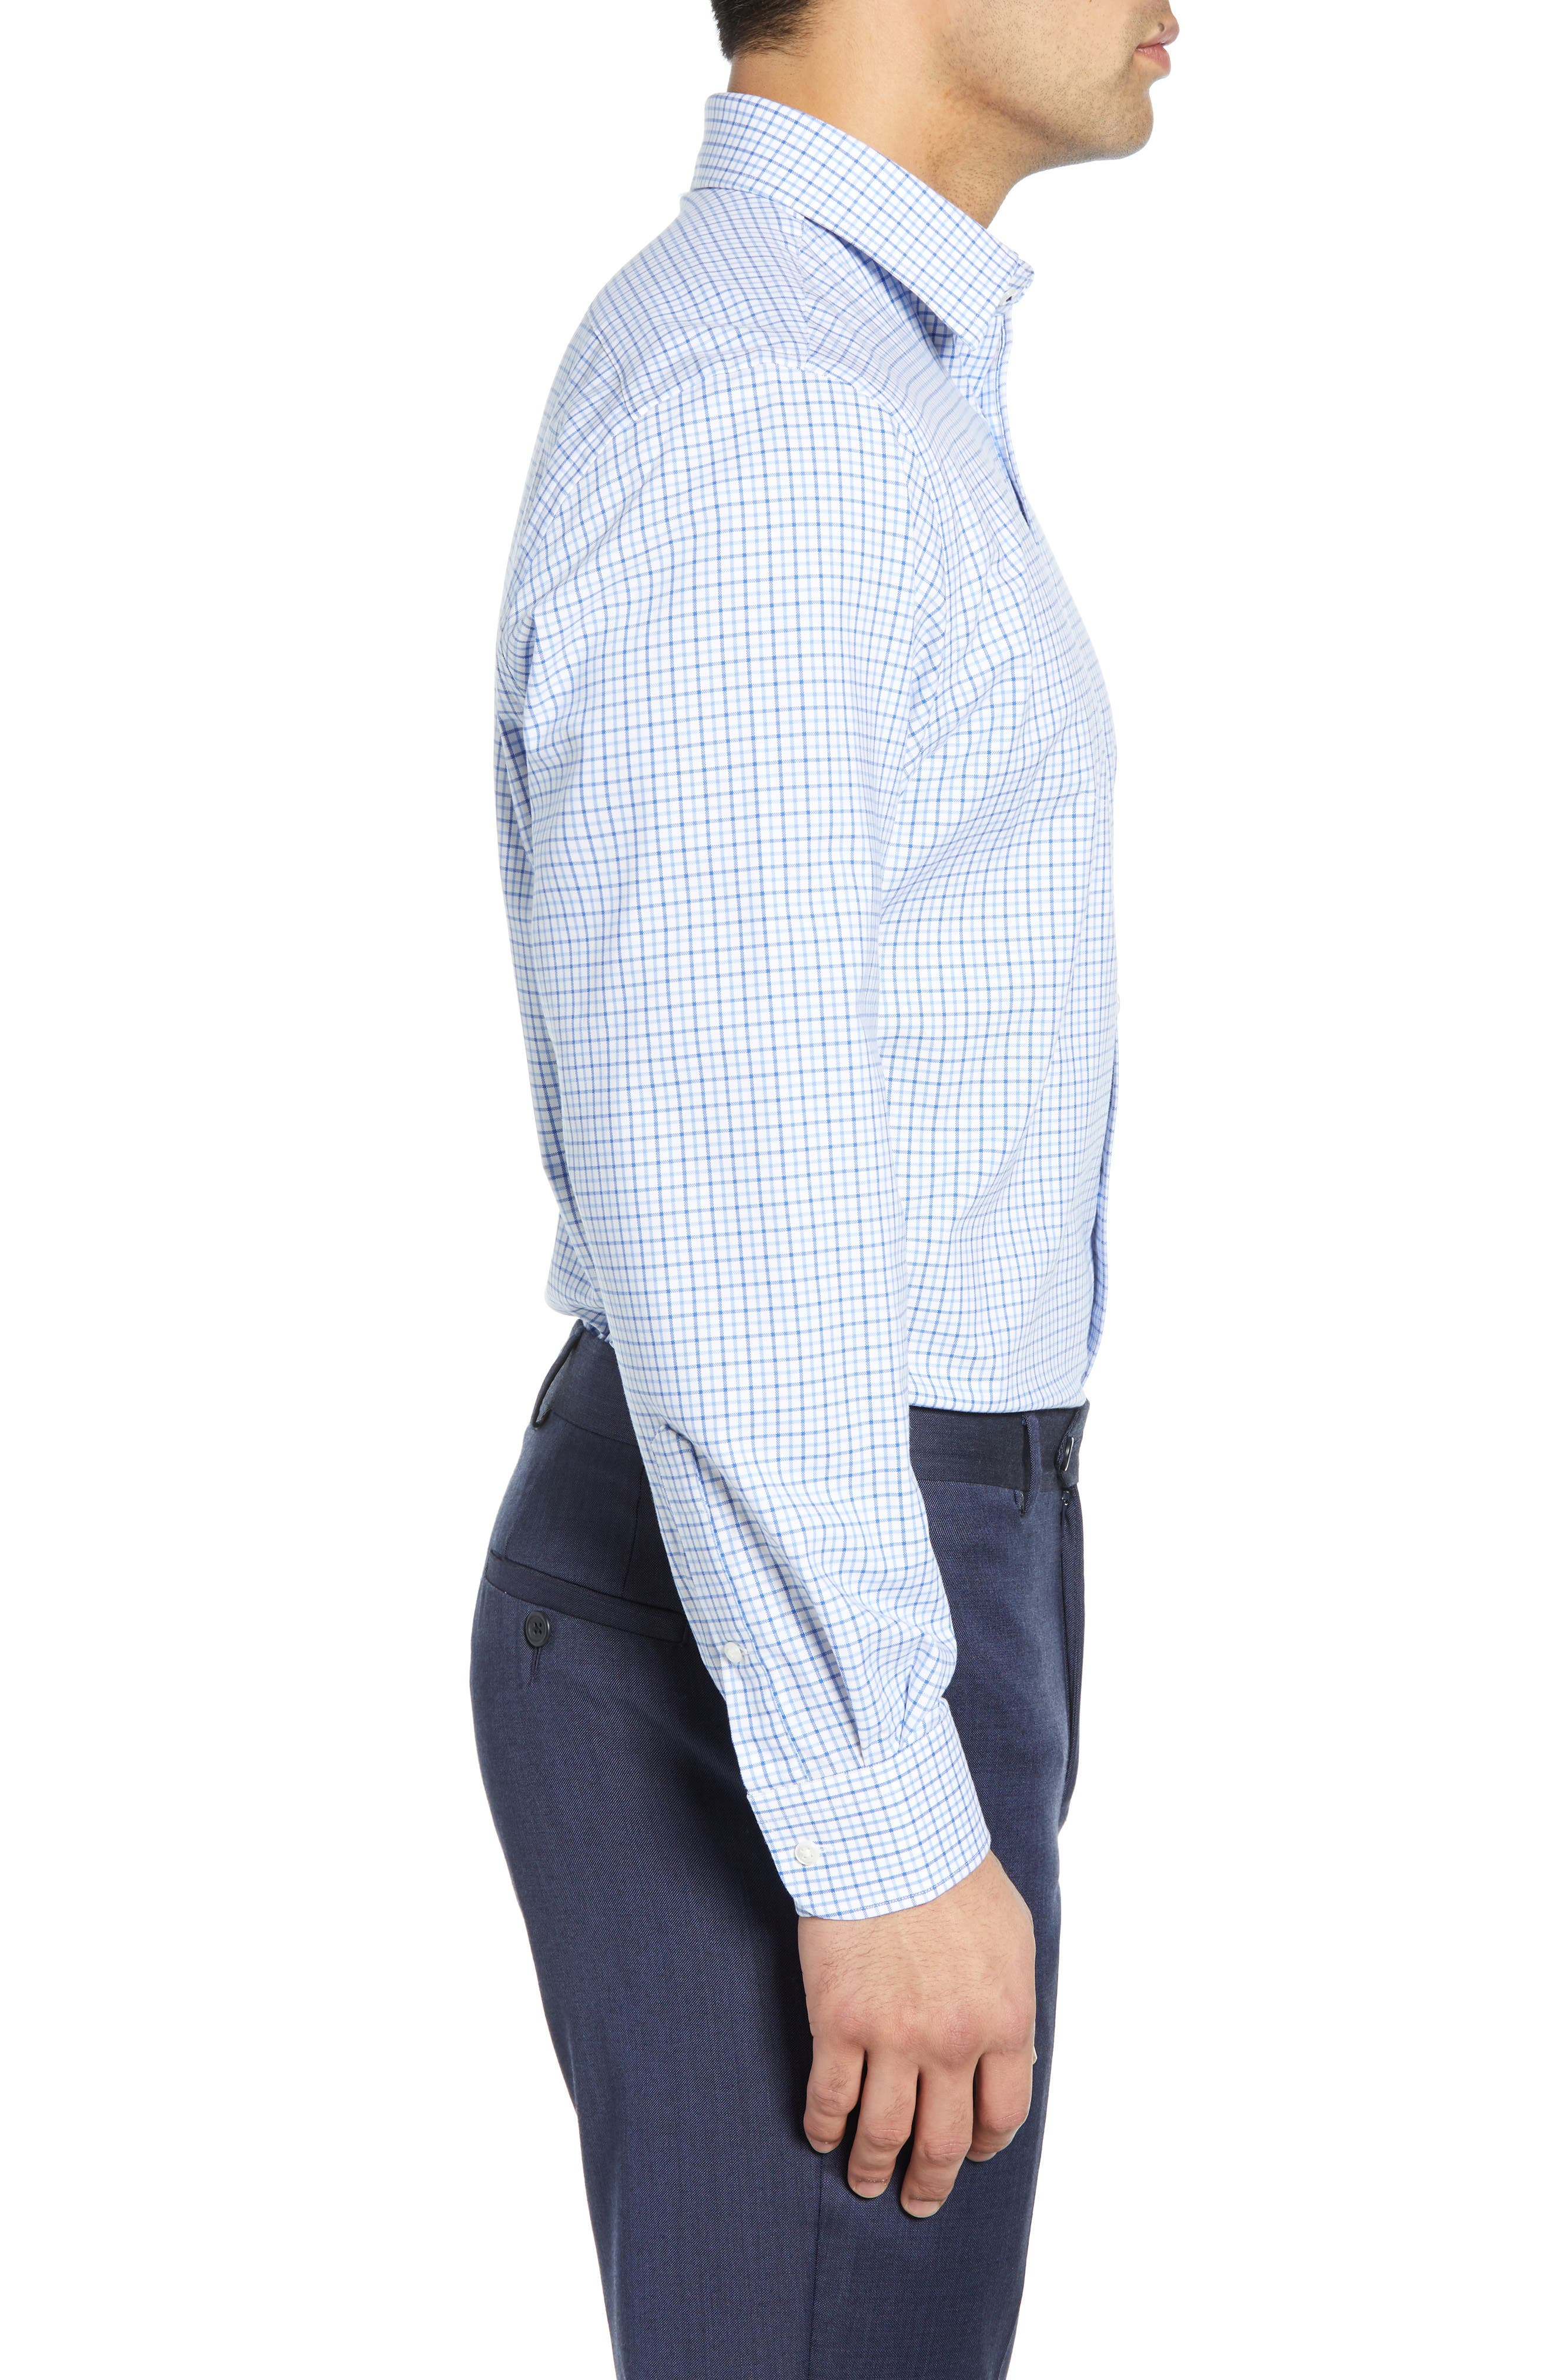 NORDSTROM MEN'S SHOP,                             Tech-Smart Traditional Fit Check Stretch Dress Shirt,                             Alternate thumbnail 4, color,                             BLUE VICTORIA